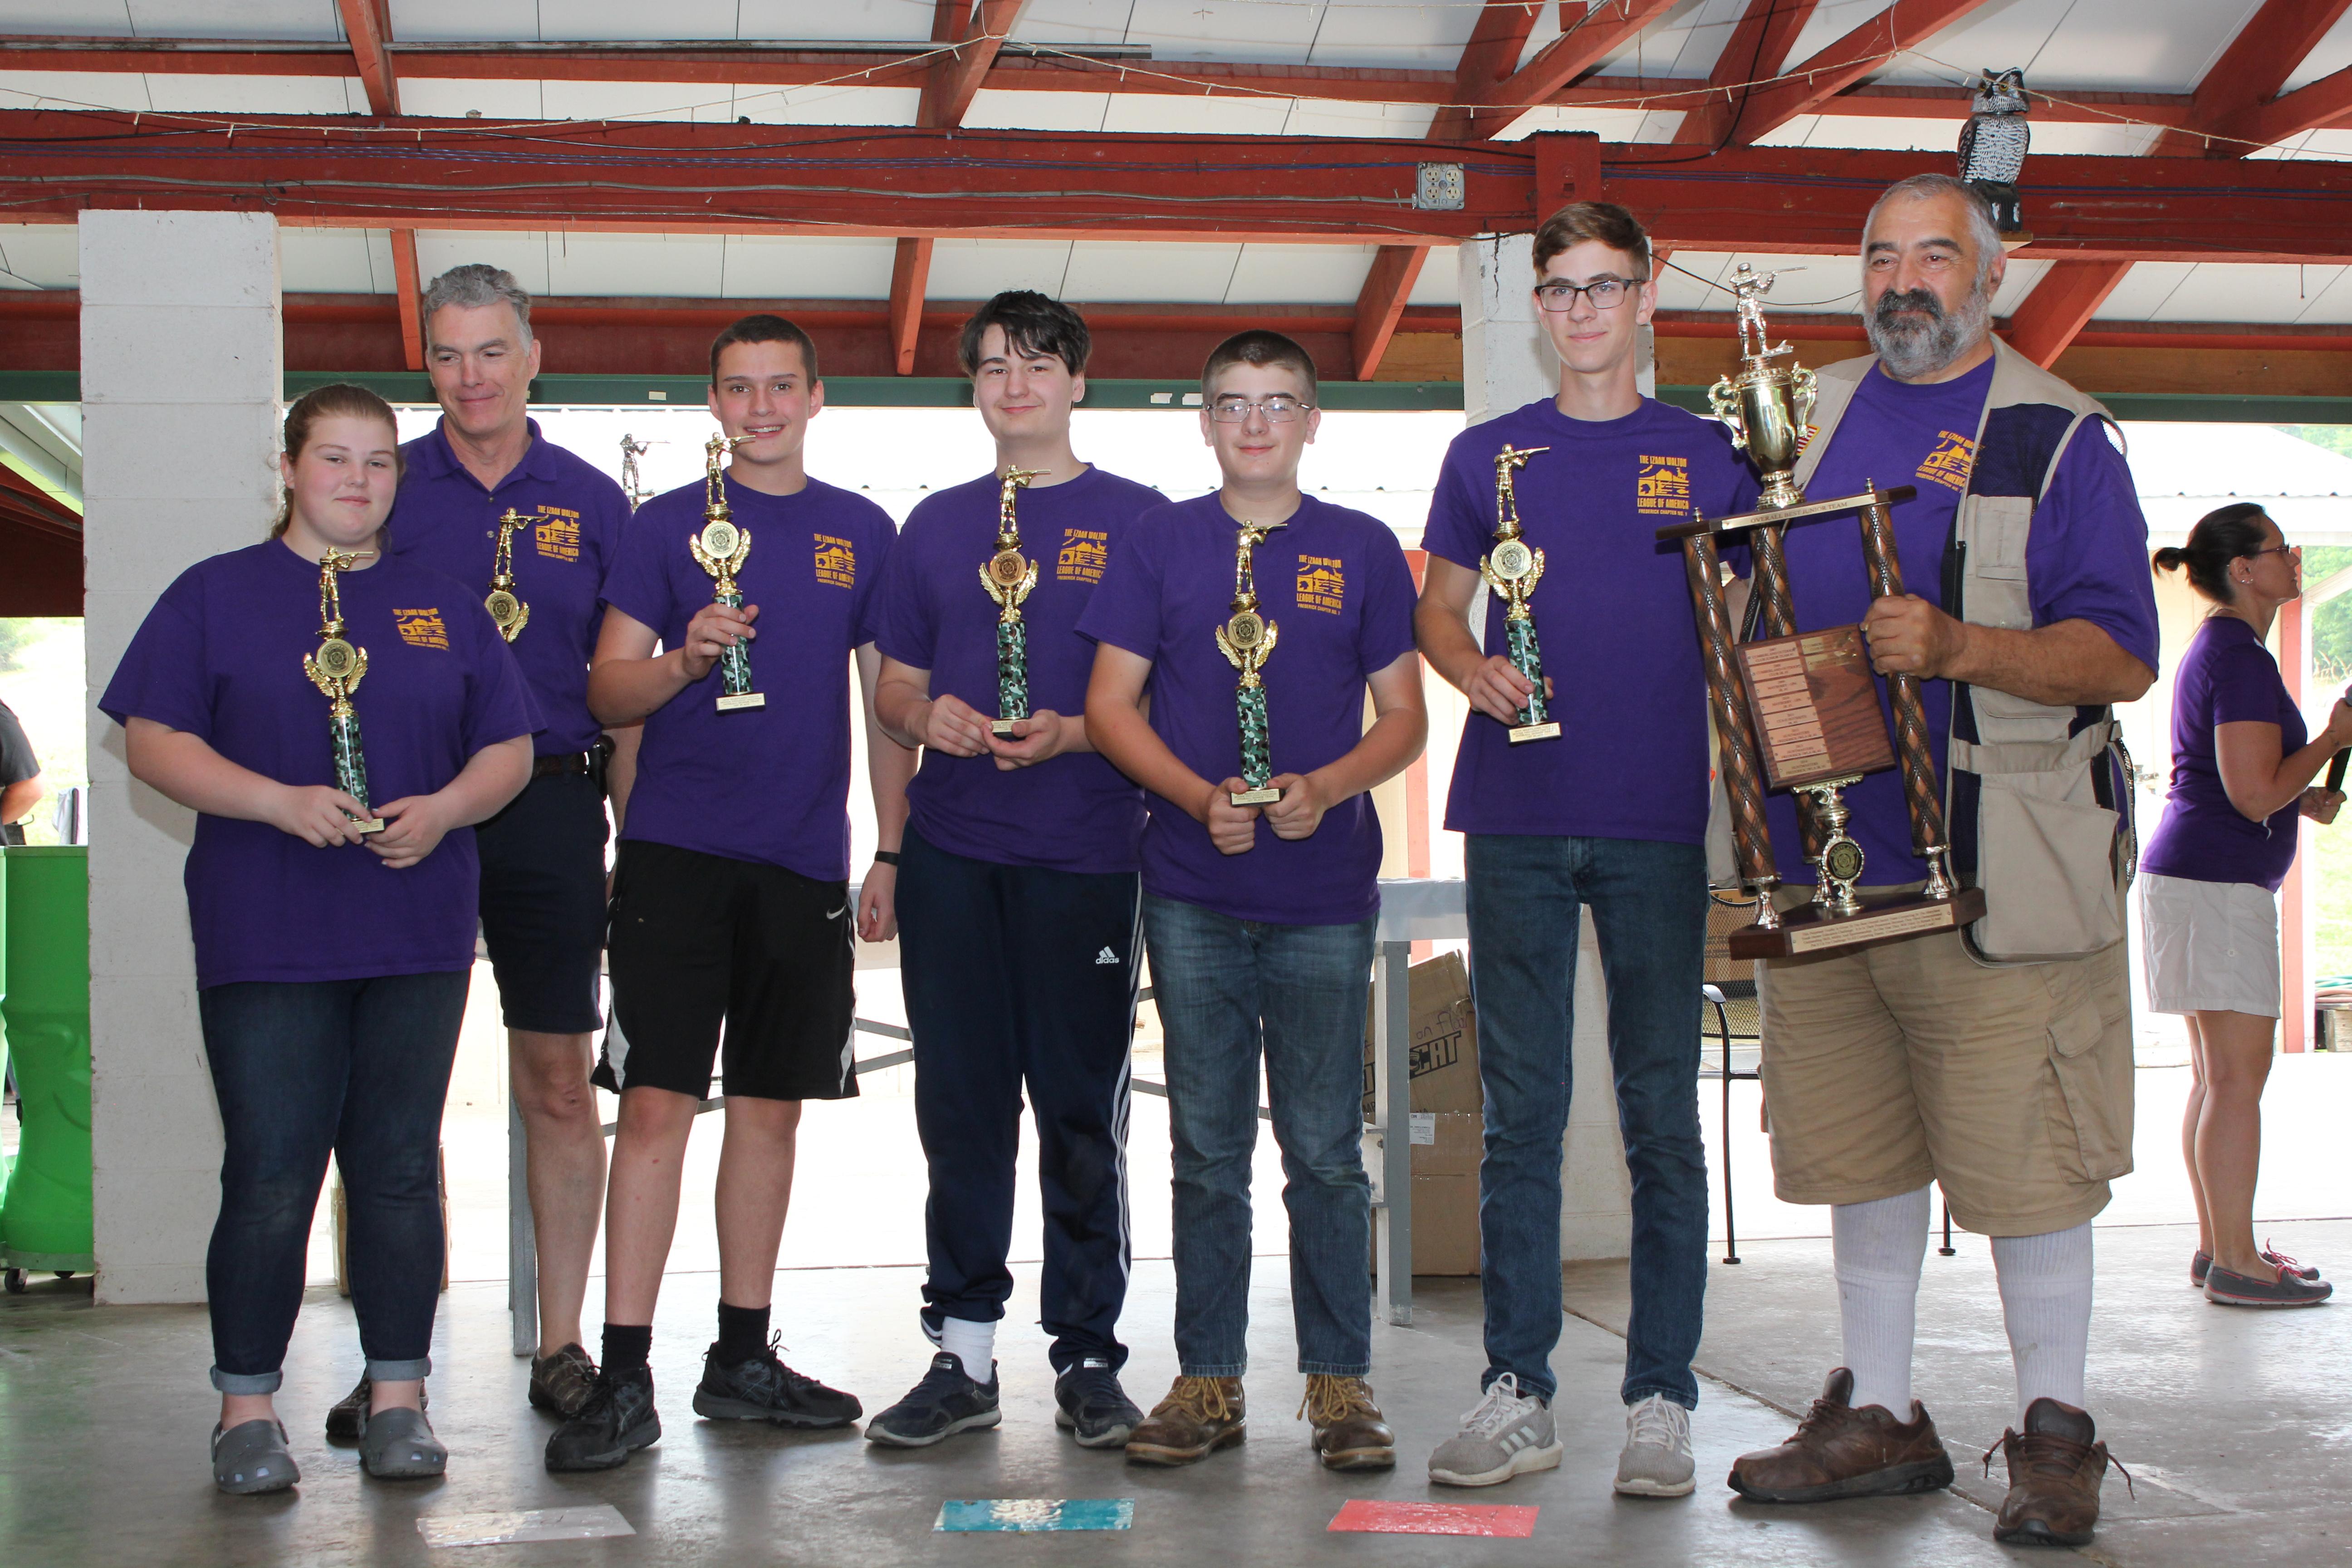 1st Place Senior Team - 2019